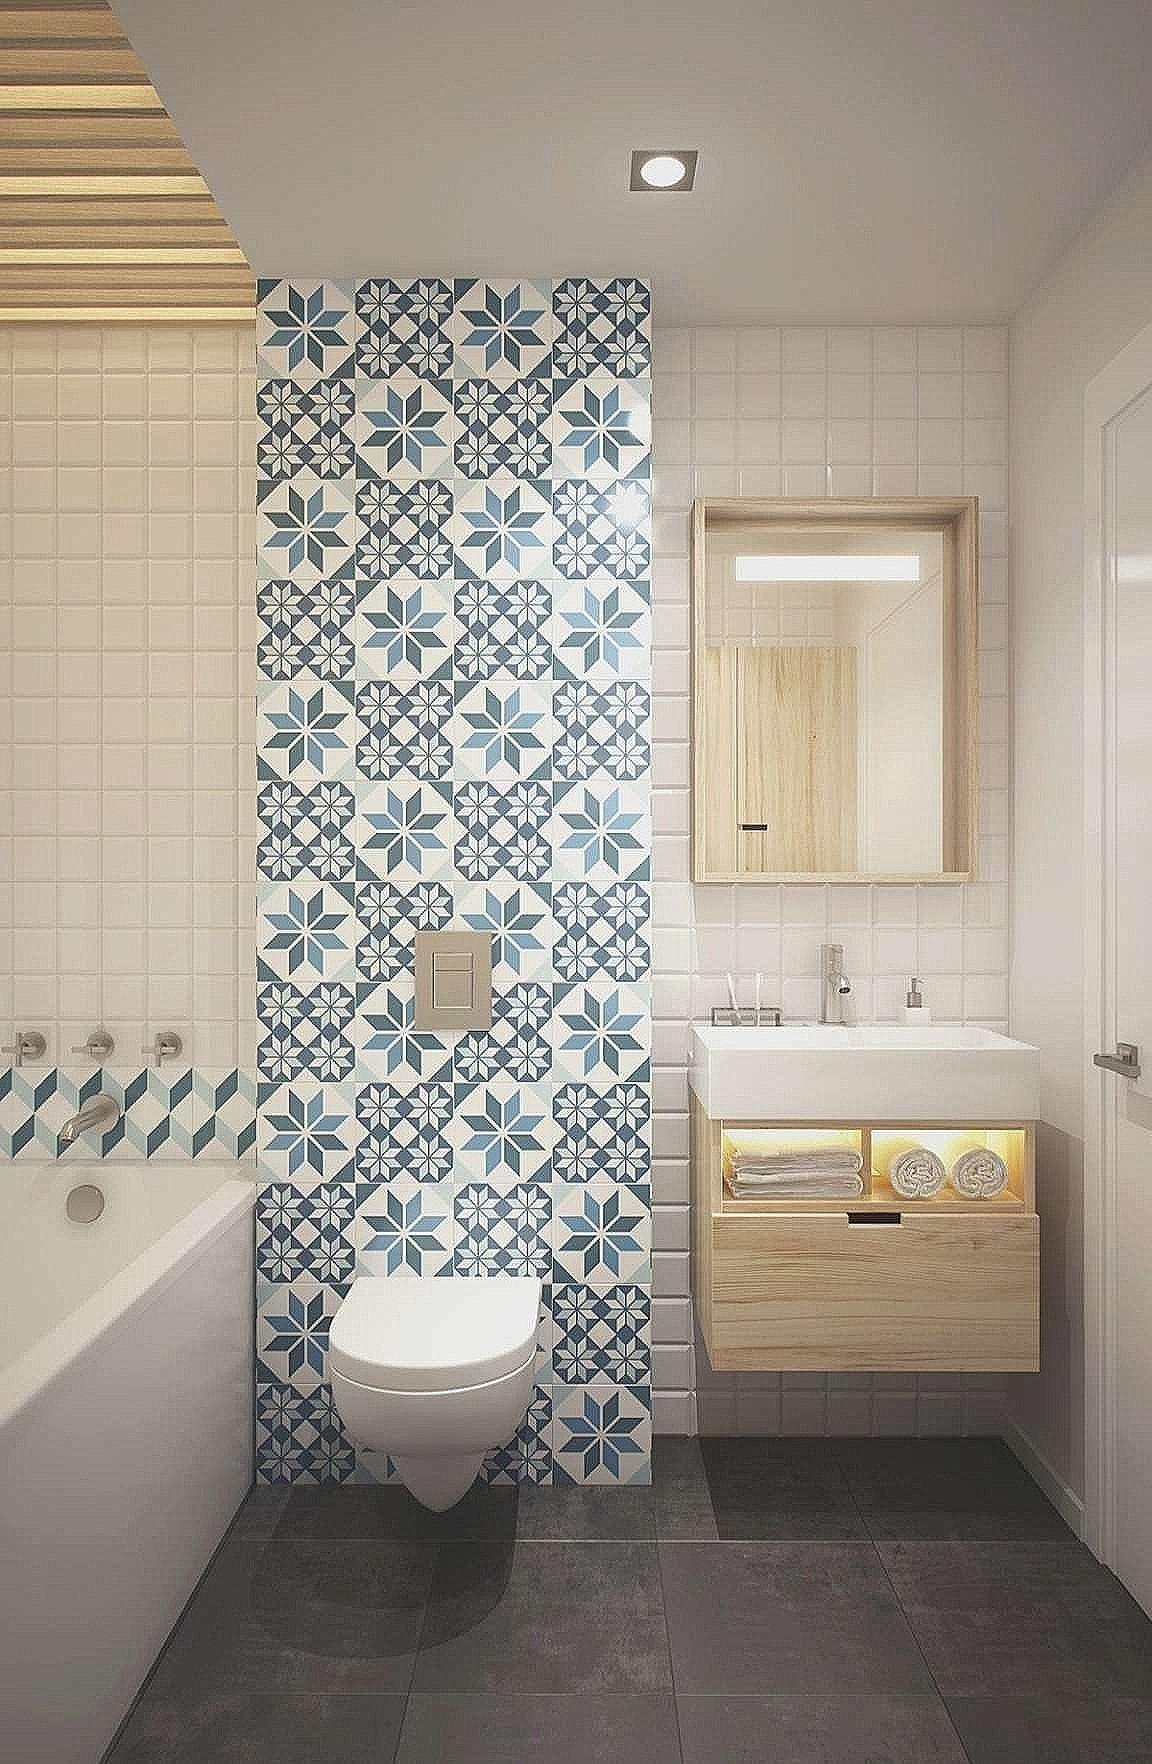 Awesome bathroom shower design ideas bathroomshower